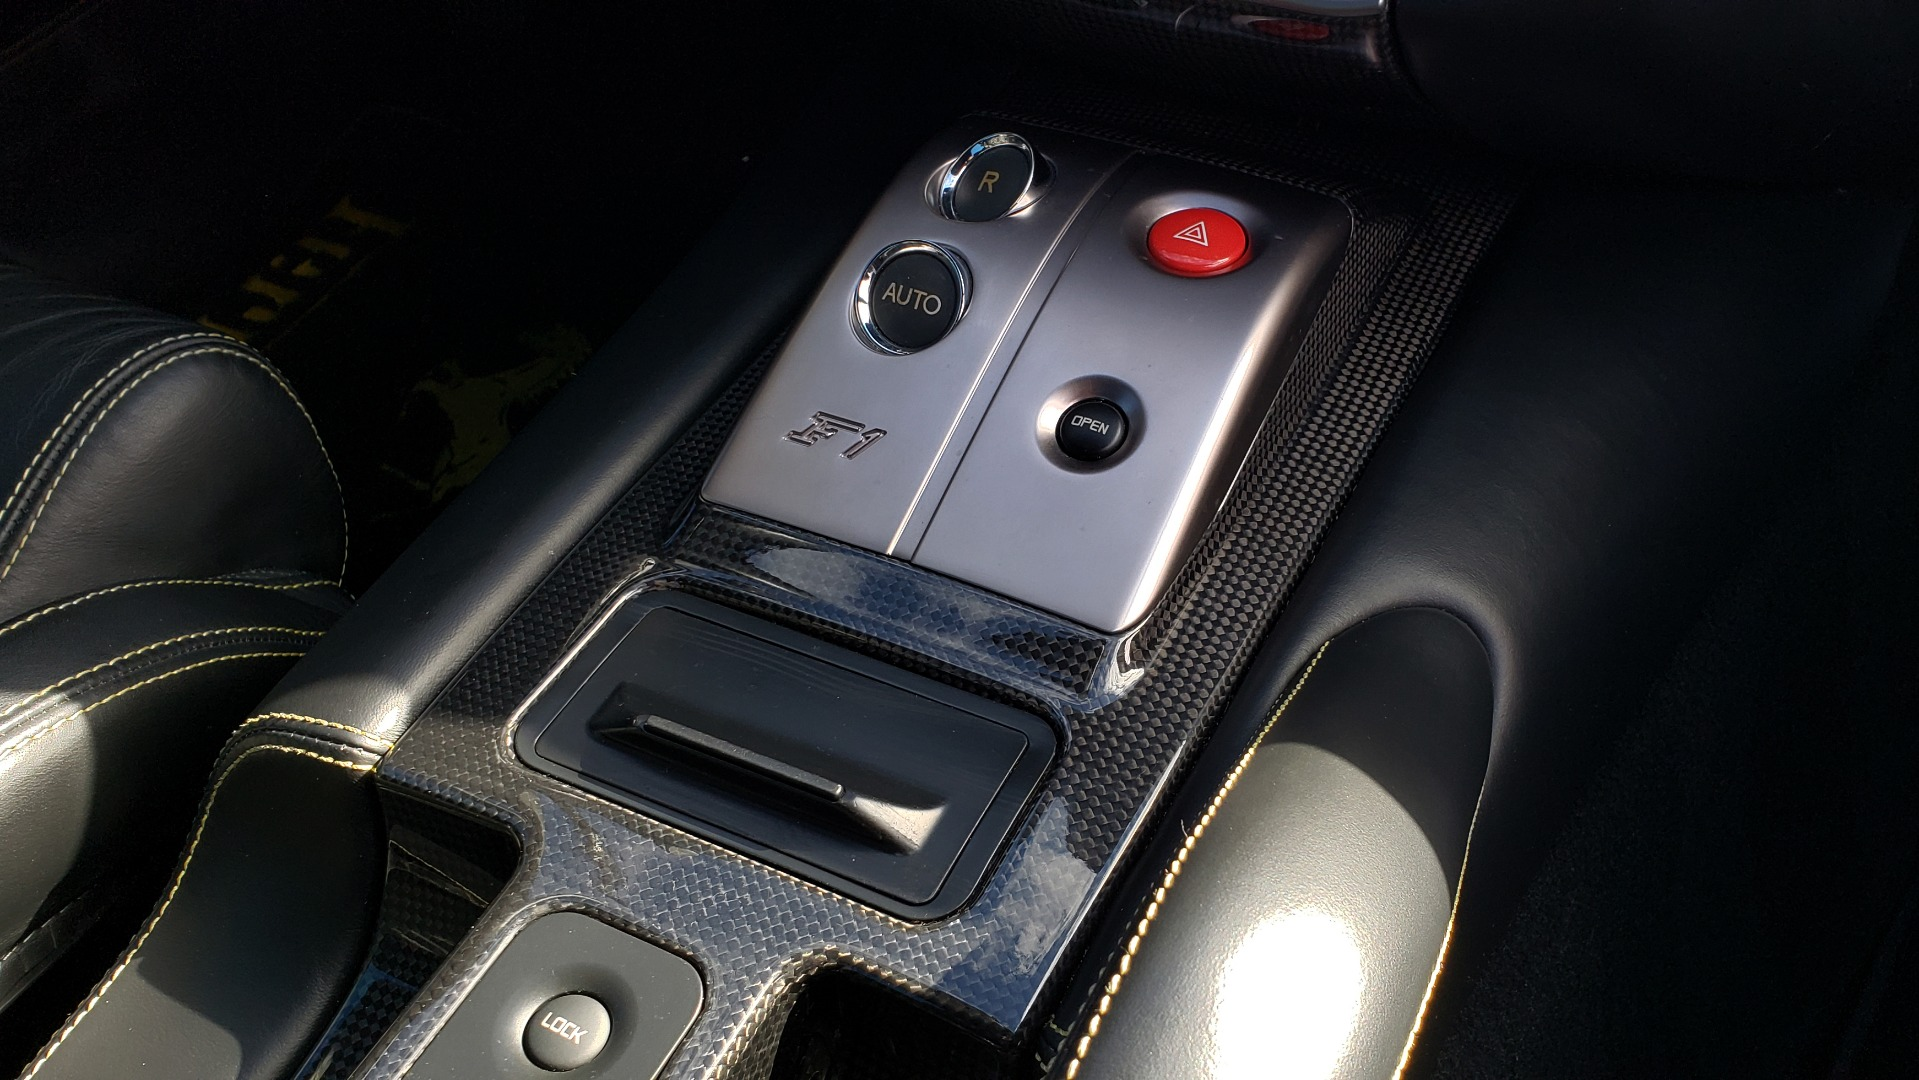 Used 2007 Ferrari 599 GTB FIORANO HGTE / V12 / F1 TRANS / NAV / BOSE / CUSTOM WHEELS for sale $109,999 at Formula Imports in Charlotte NC 28227 106